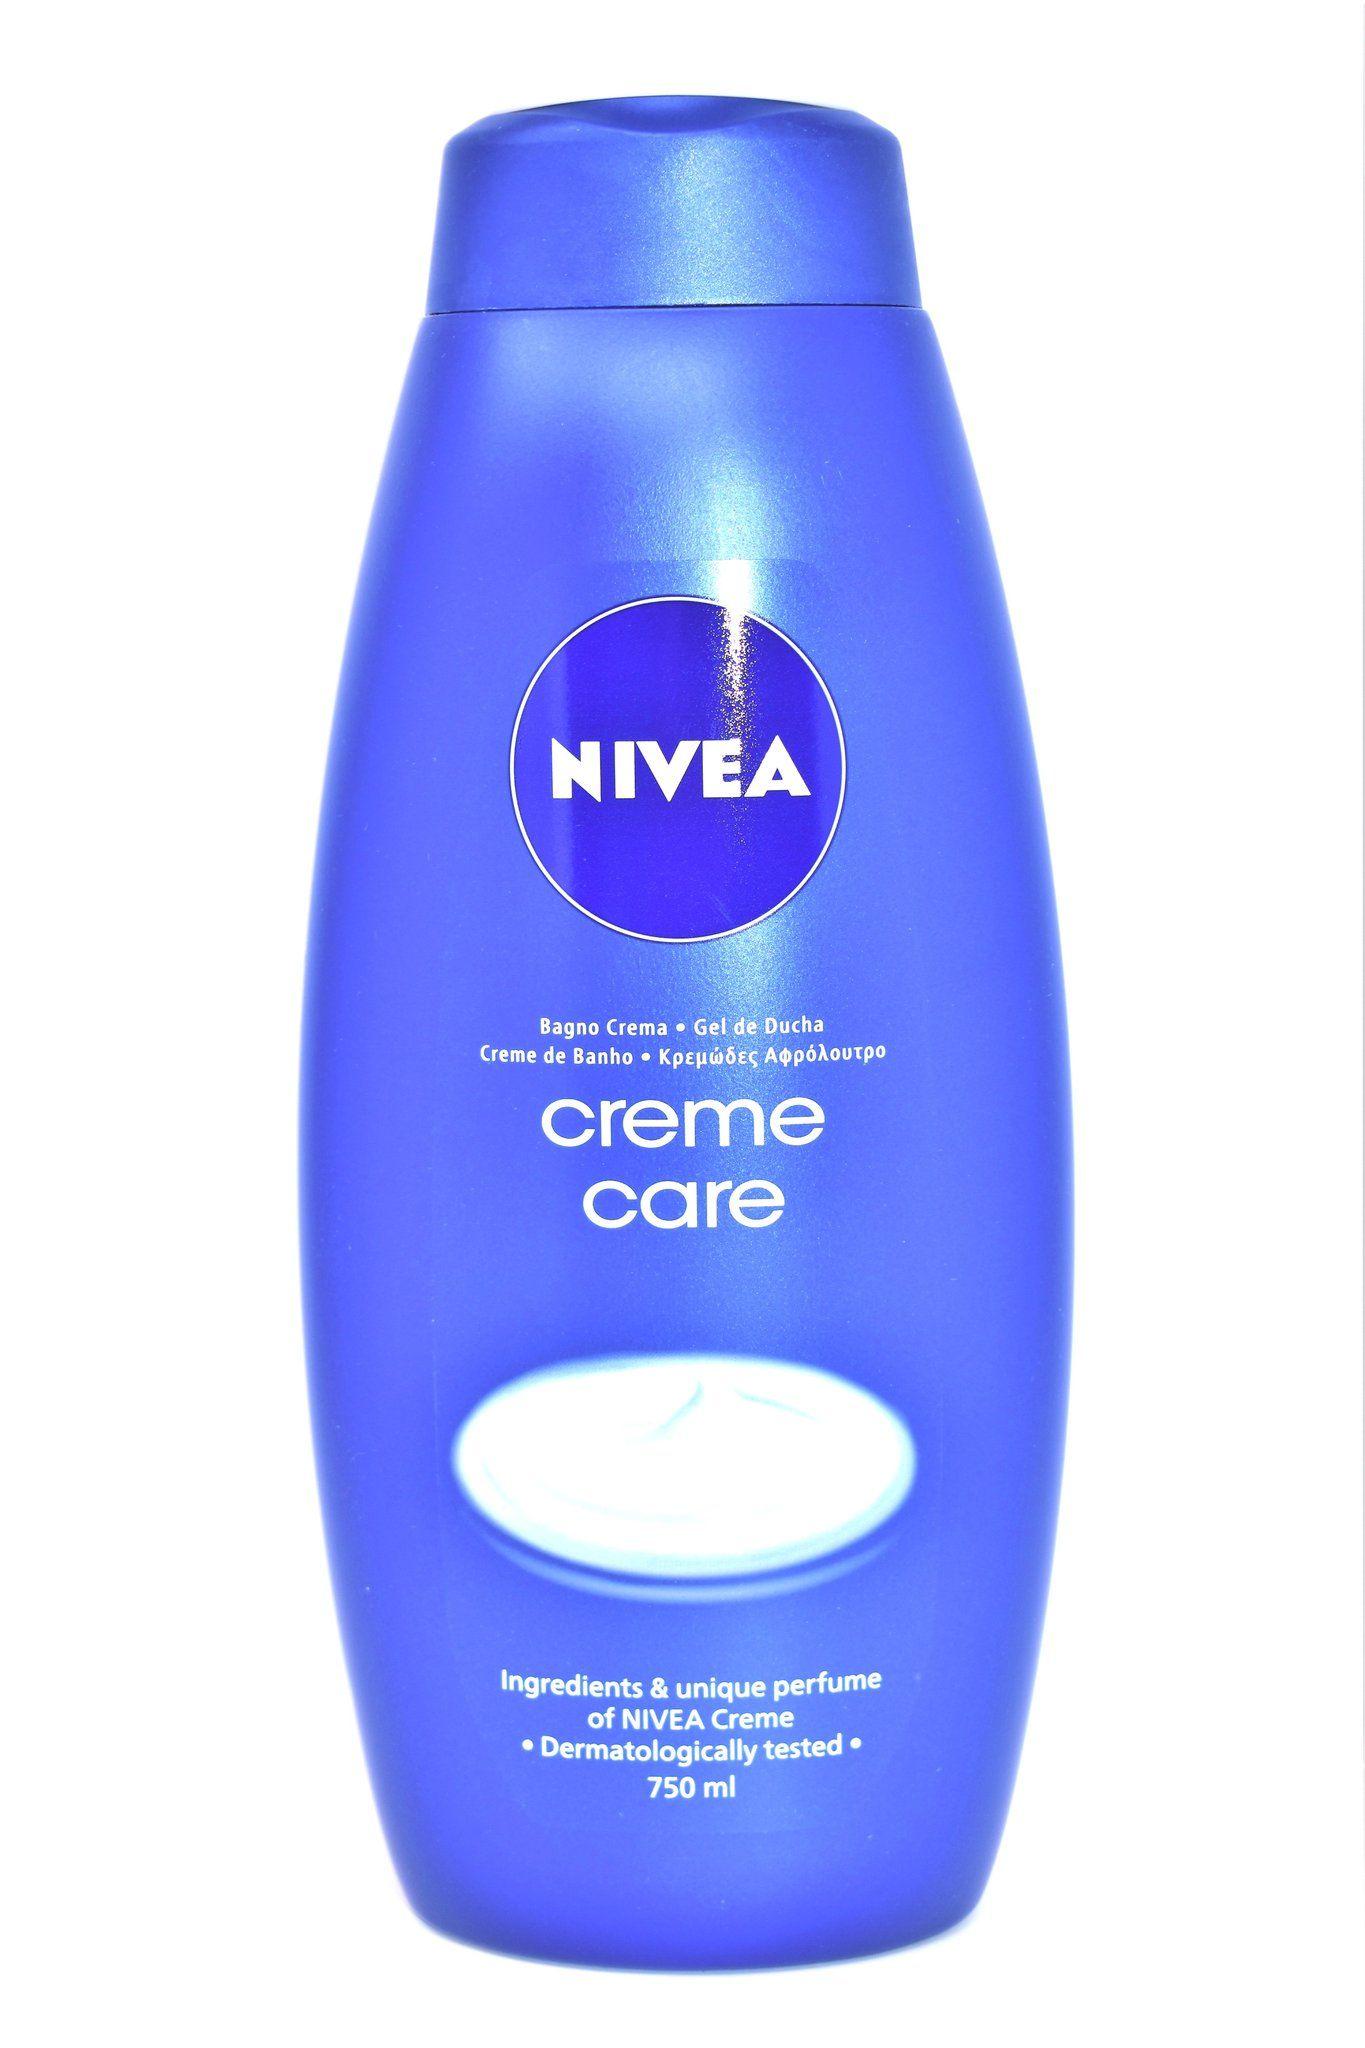 Nivea Creme Care Body Wash, 750ml Body wash, Perfume